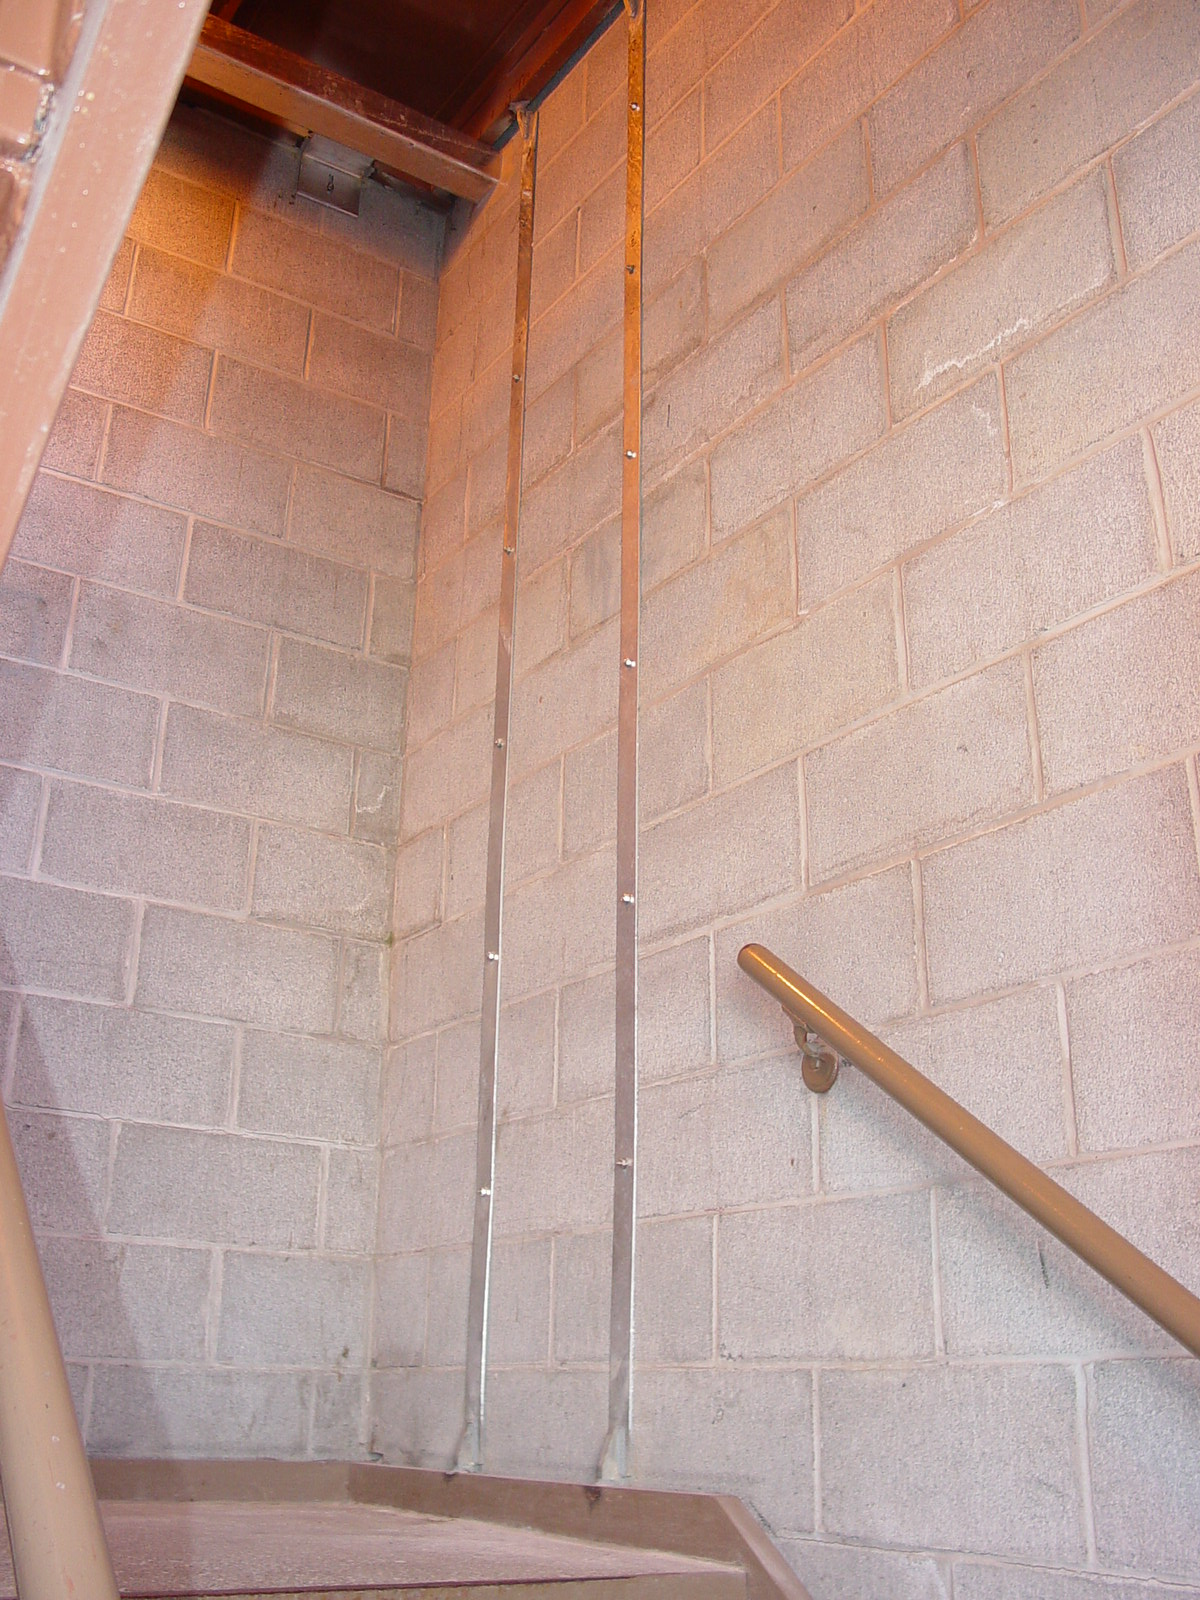 Seismic retrofit of stair towers at University Street Parking Garage